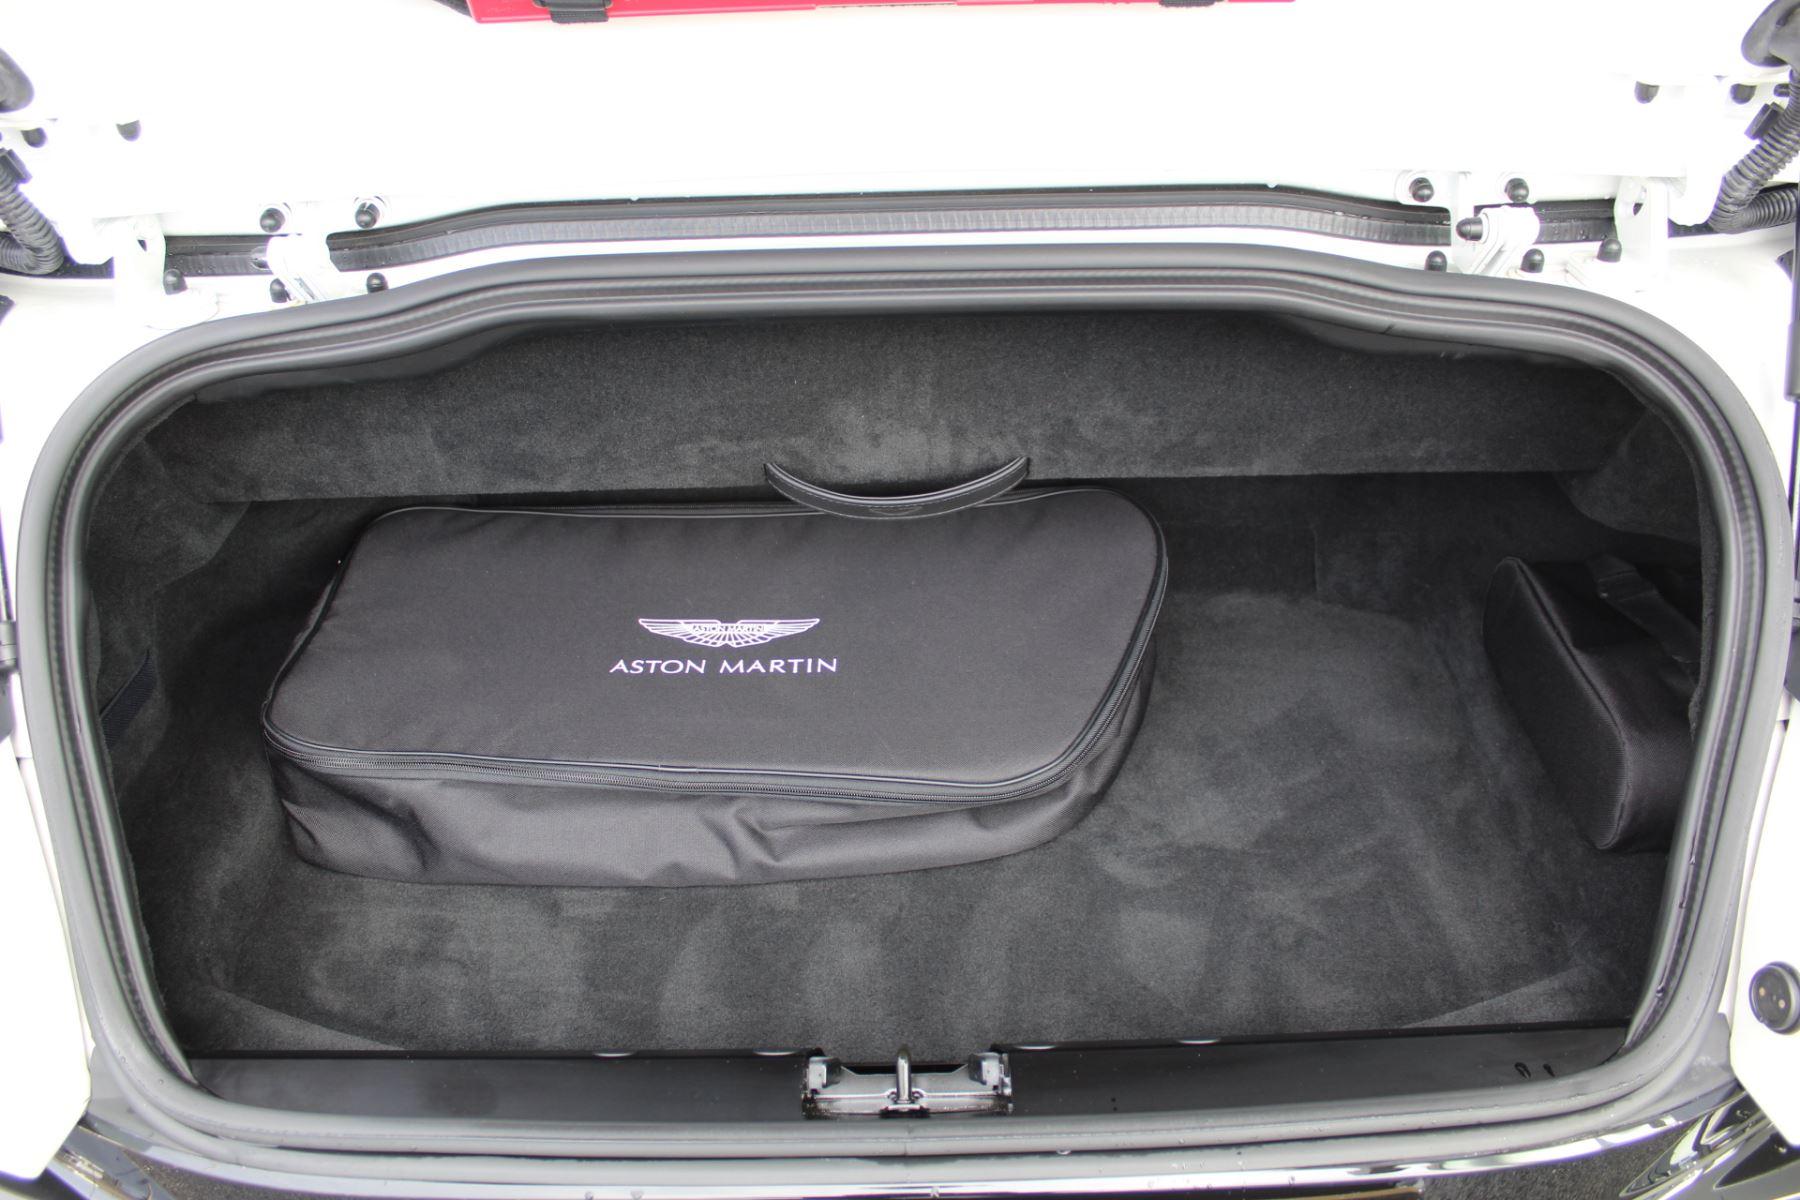 Aston Martin DB11 Volante V8 Twin Turbo image 19